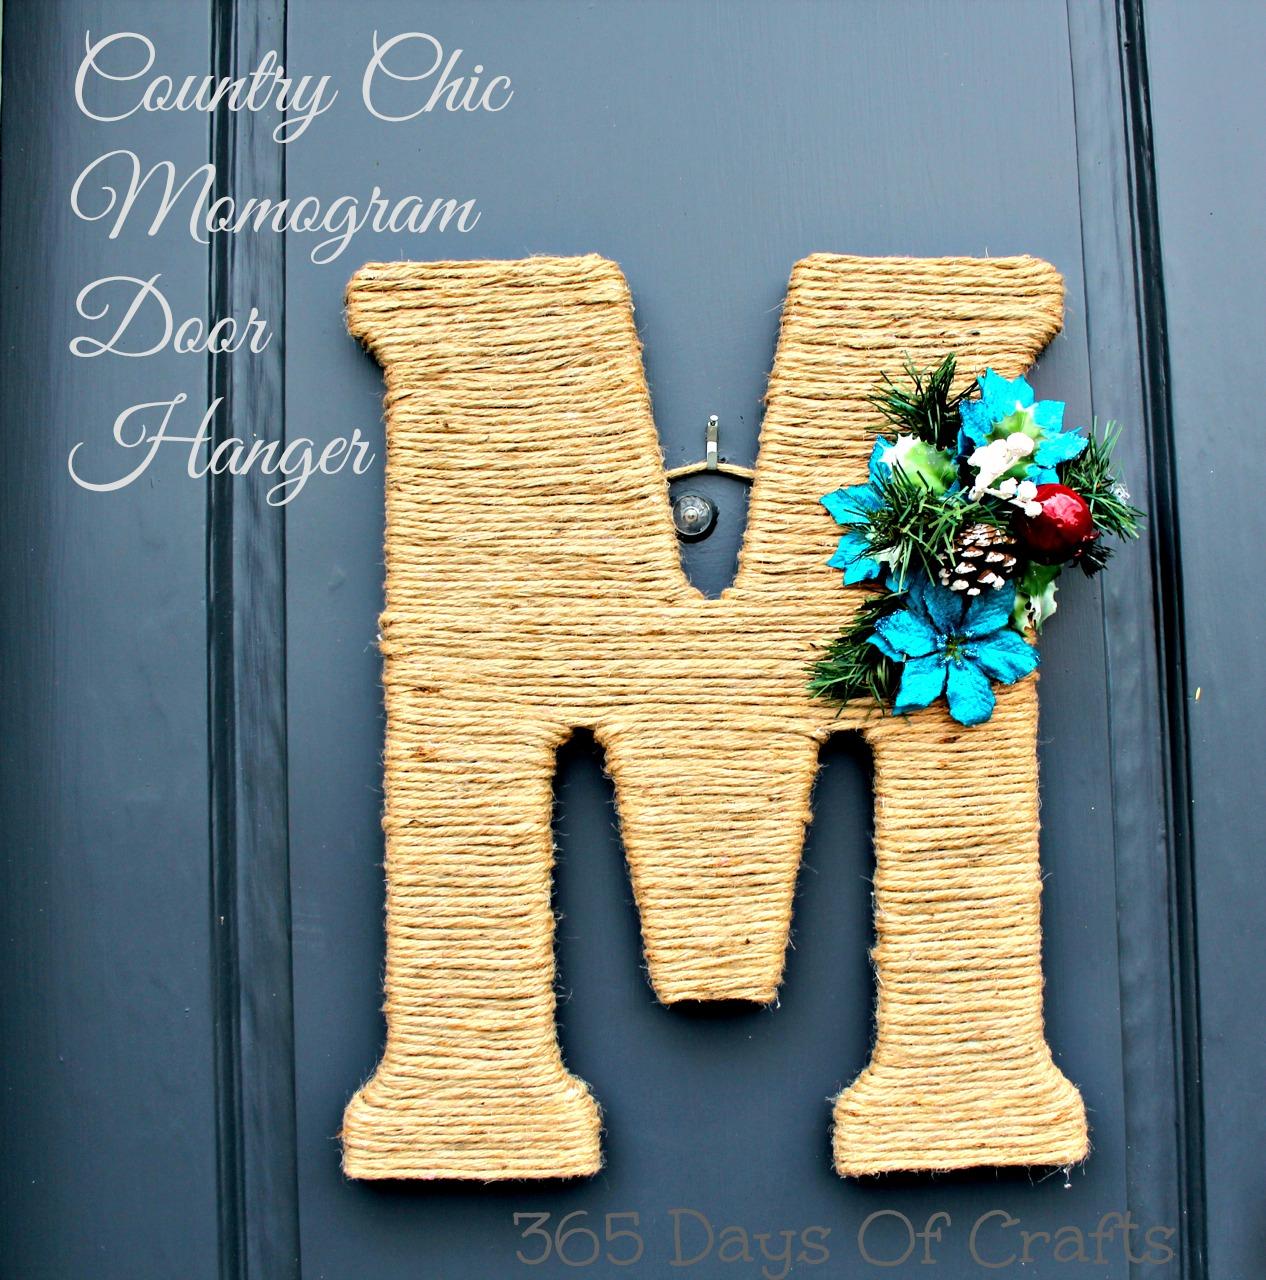 Christmas Door Frame Decorations: 365 Days Of Crafts & Inspiration